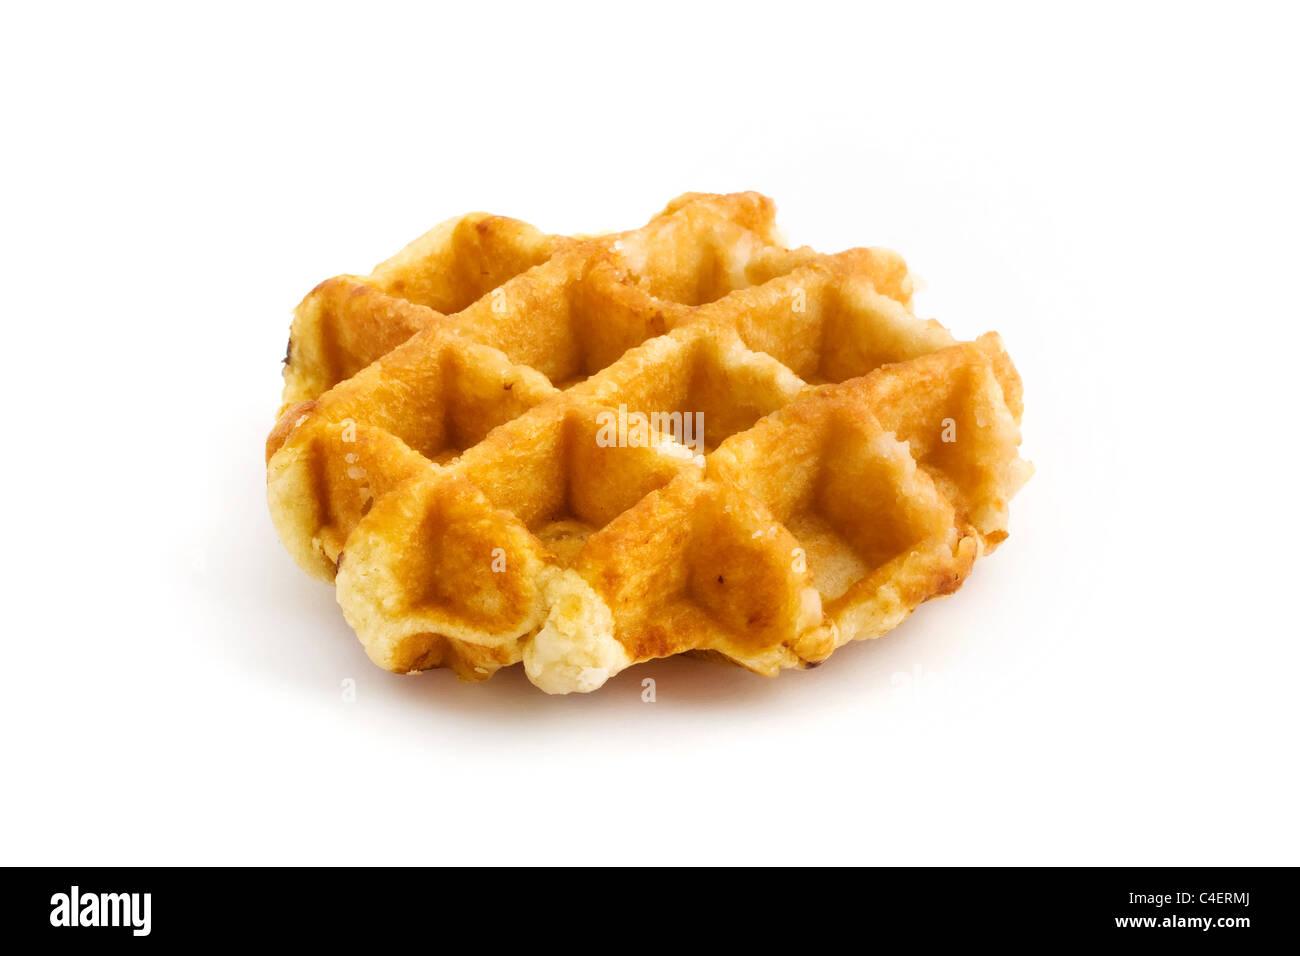 Home made fresh waffle isolated on white - Stock Image